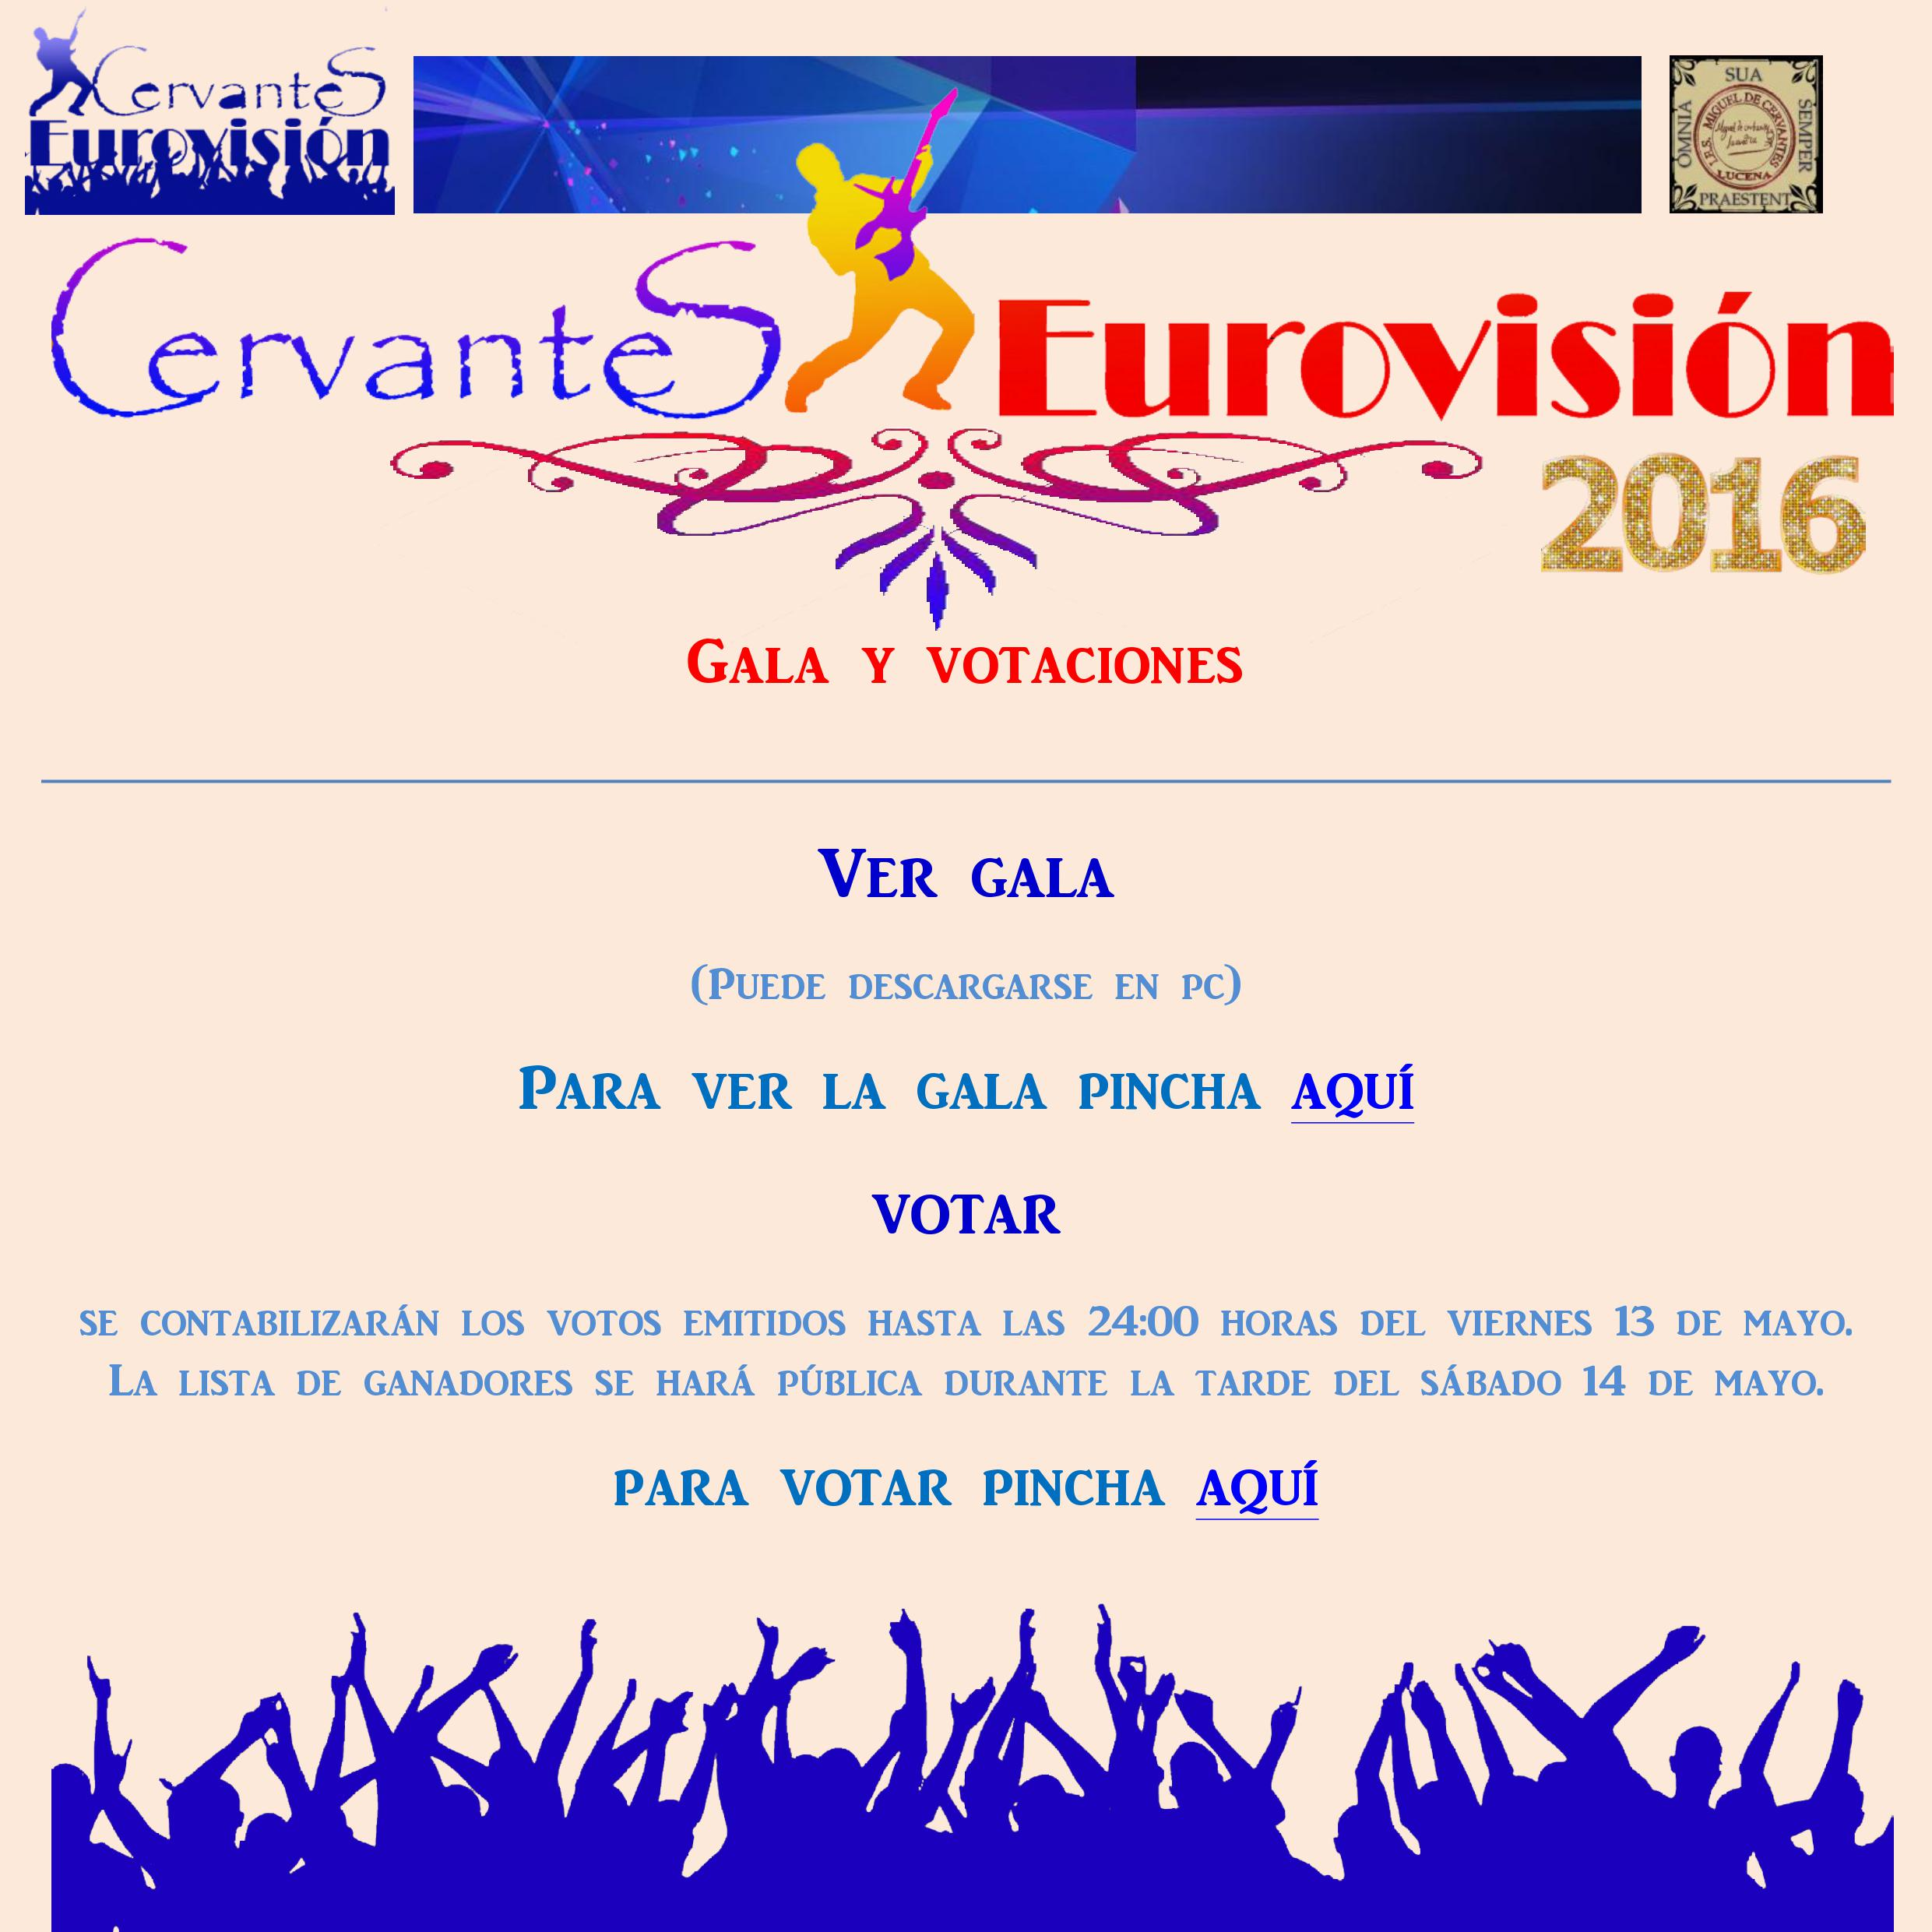 gala eurovision 2016